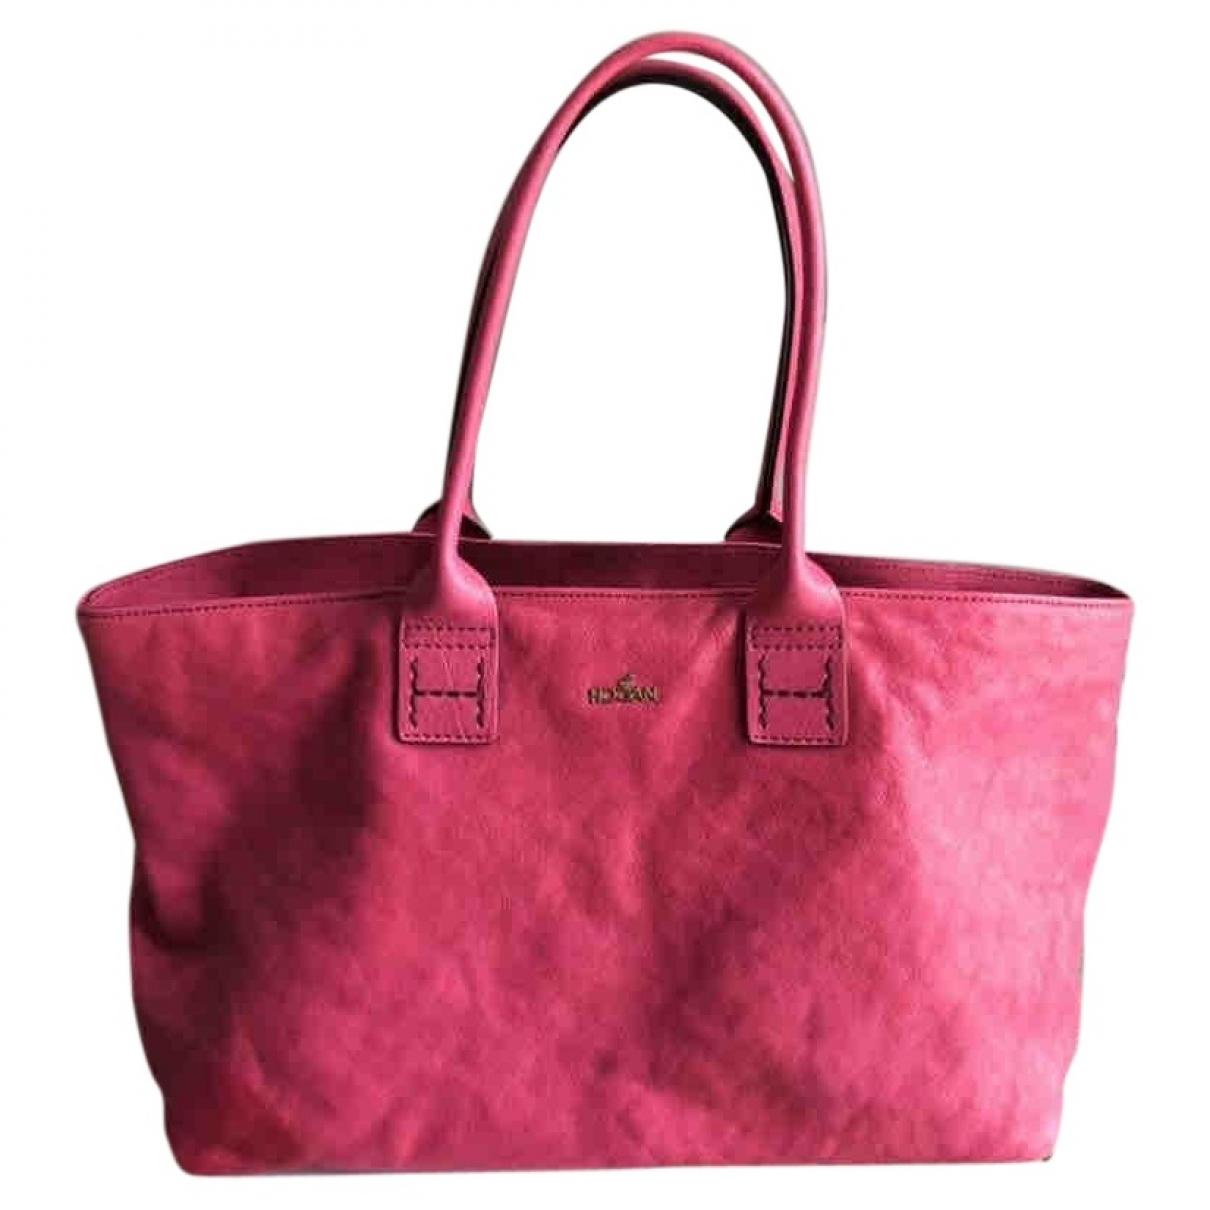 Hogan \N Pink Leather handbag for Women \N